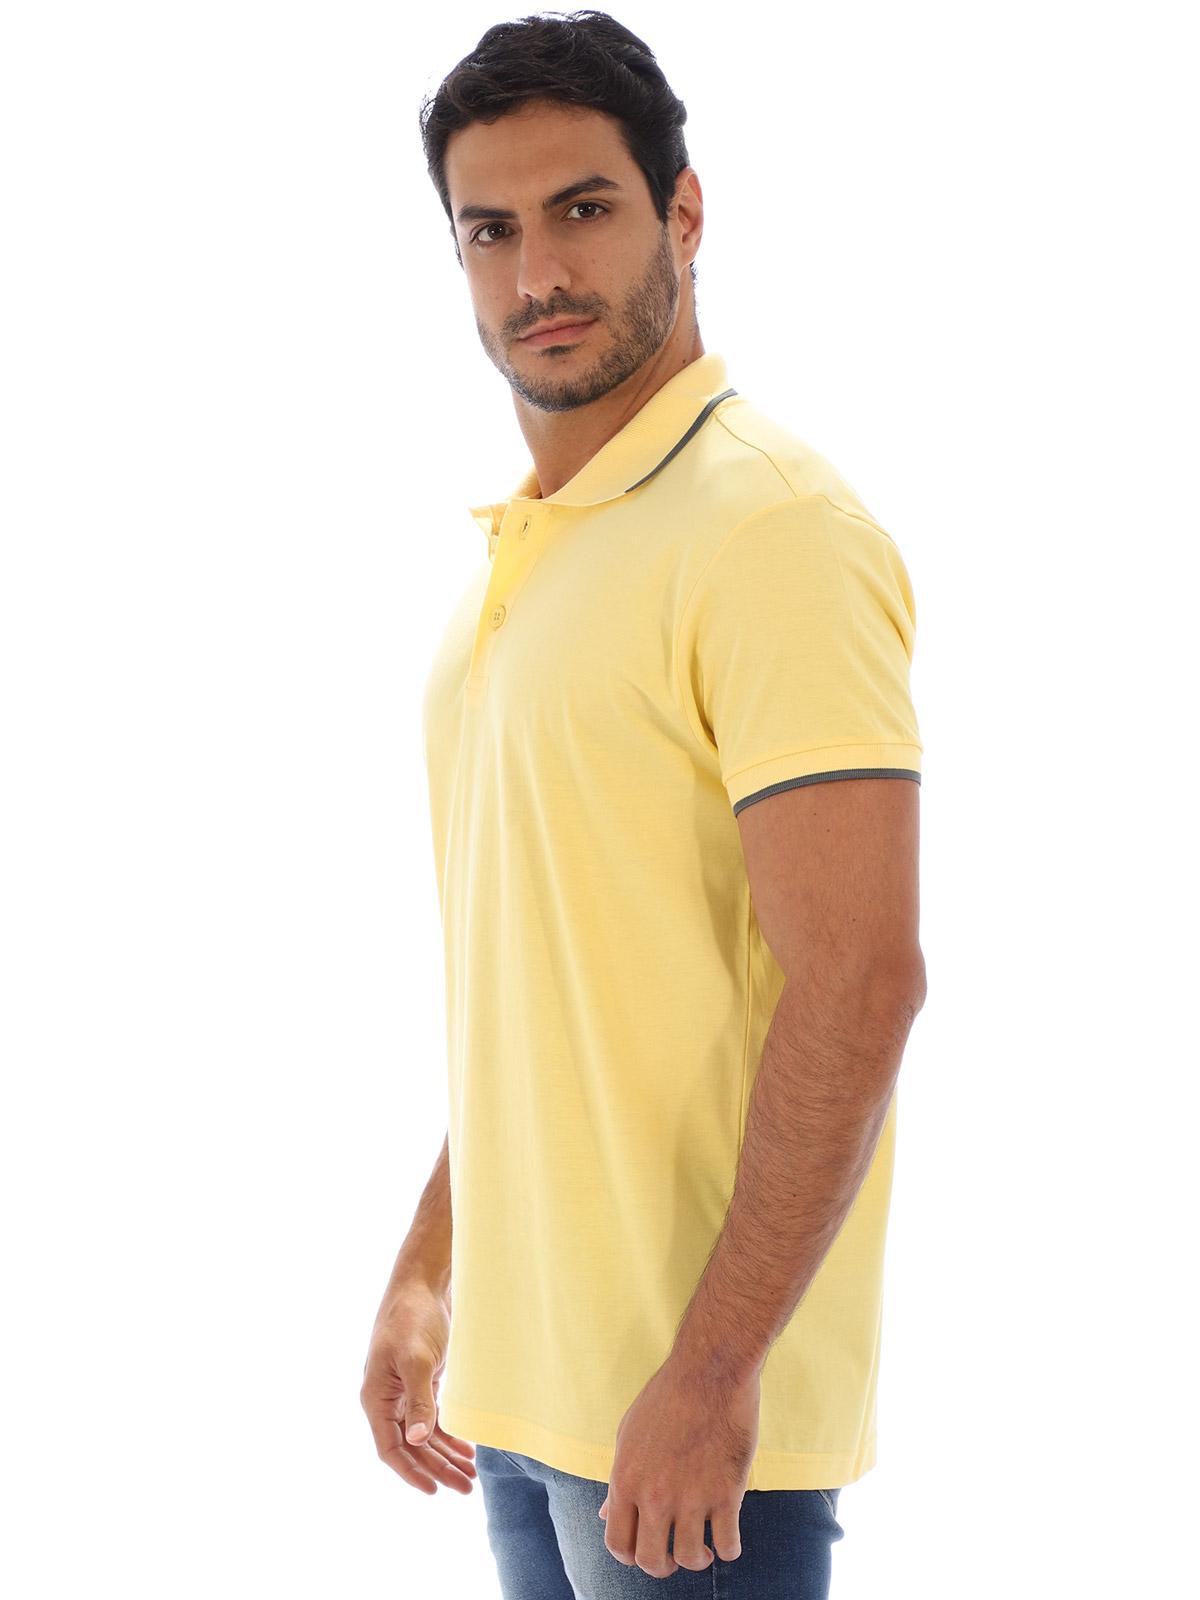 Camisa Polo Masculina Lisa Com Punho Filete Amarela